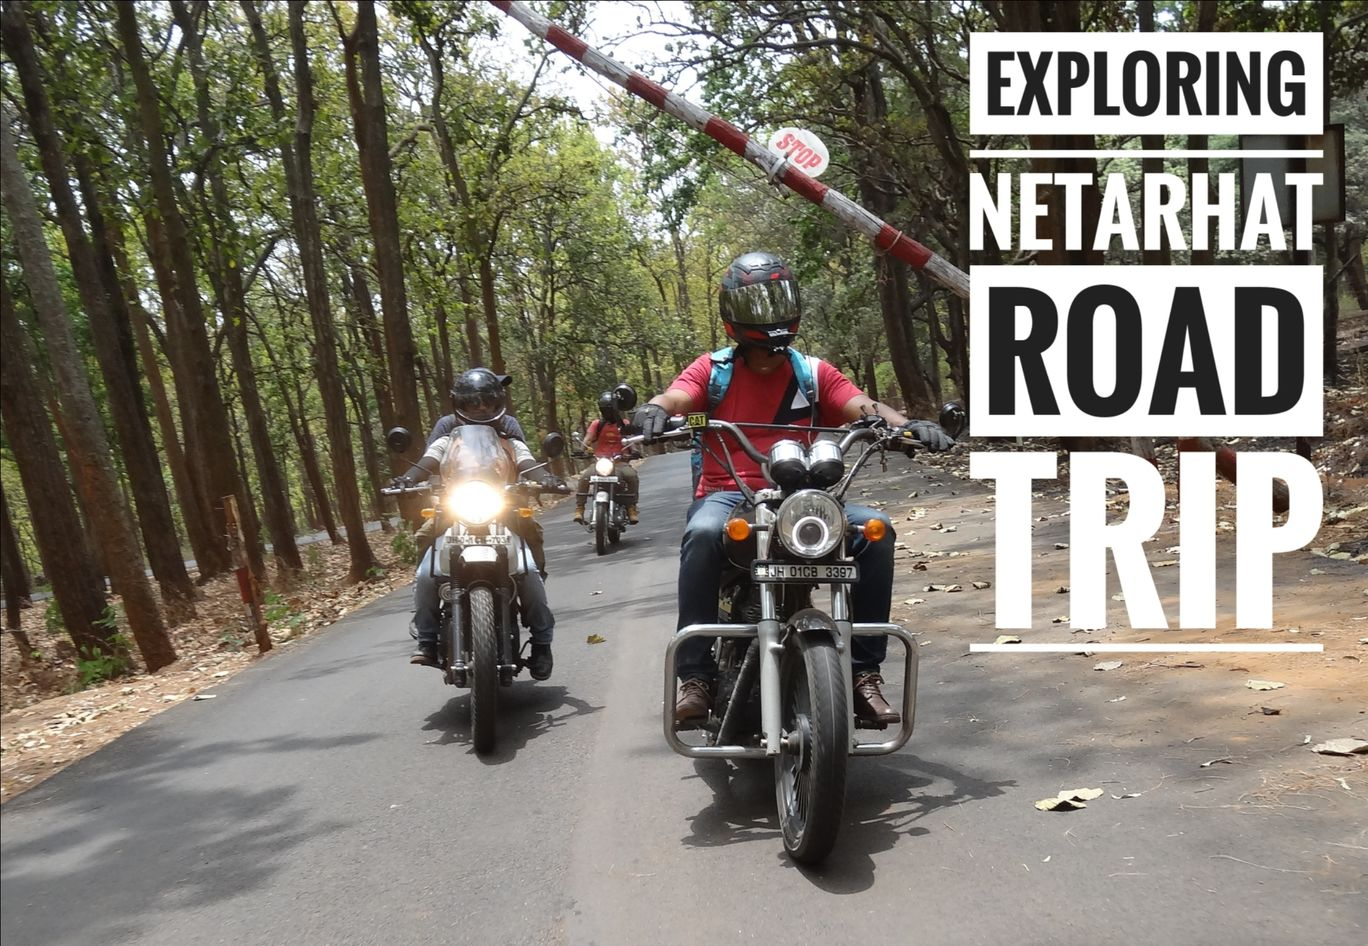 Photo of Netarhat road trip By Nitesh demta